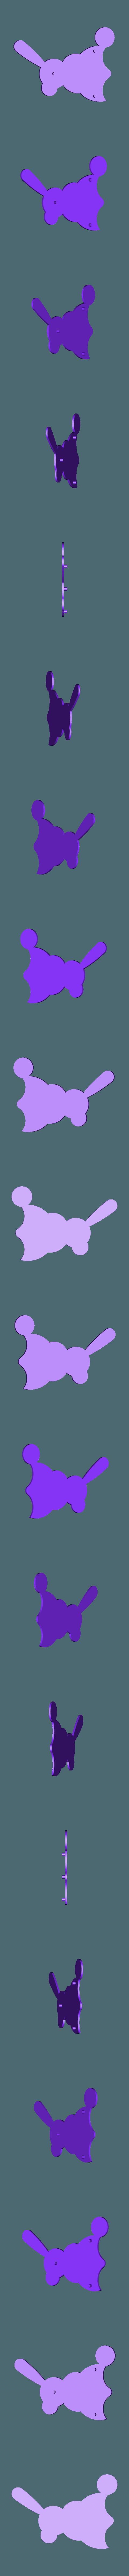 Body_Left_Solid.stl Download free STL file Windup Bunny • 3D printing design, gzumwalt